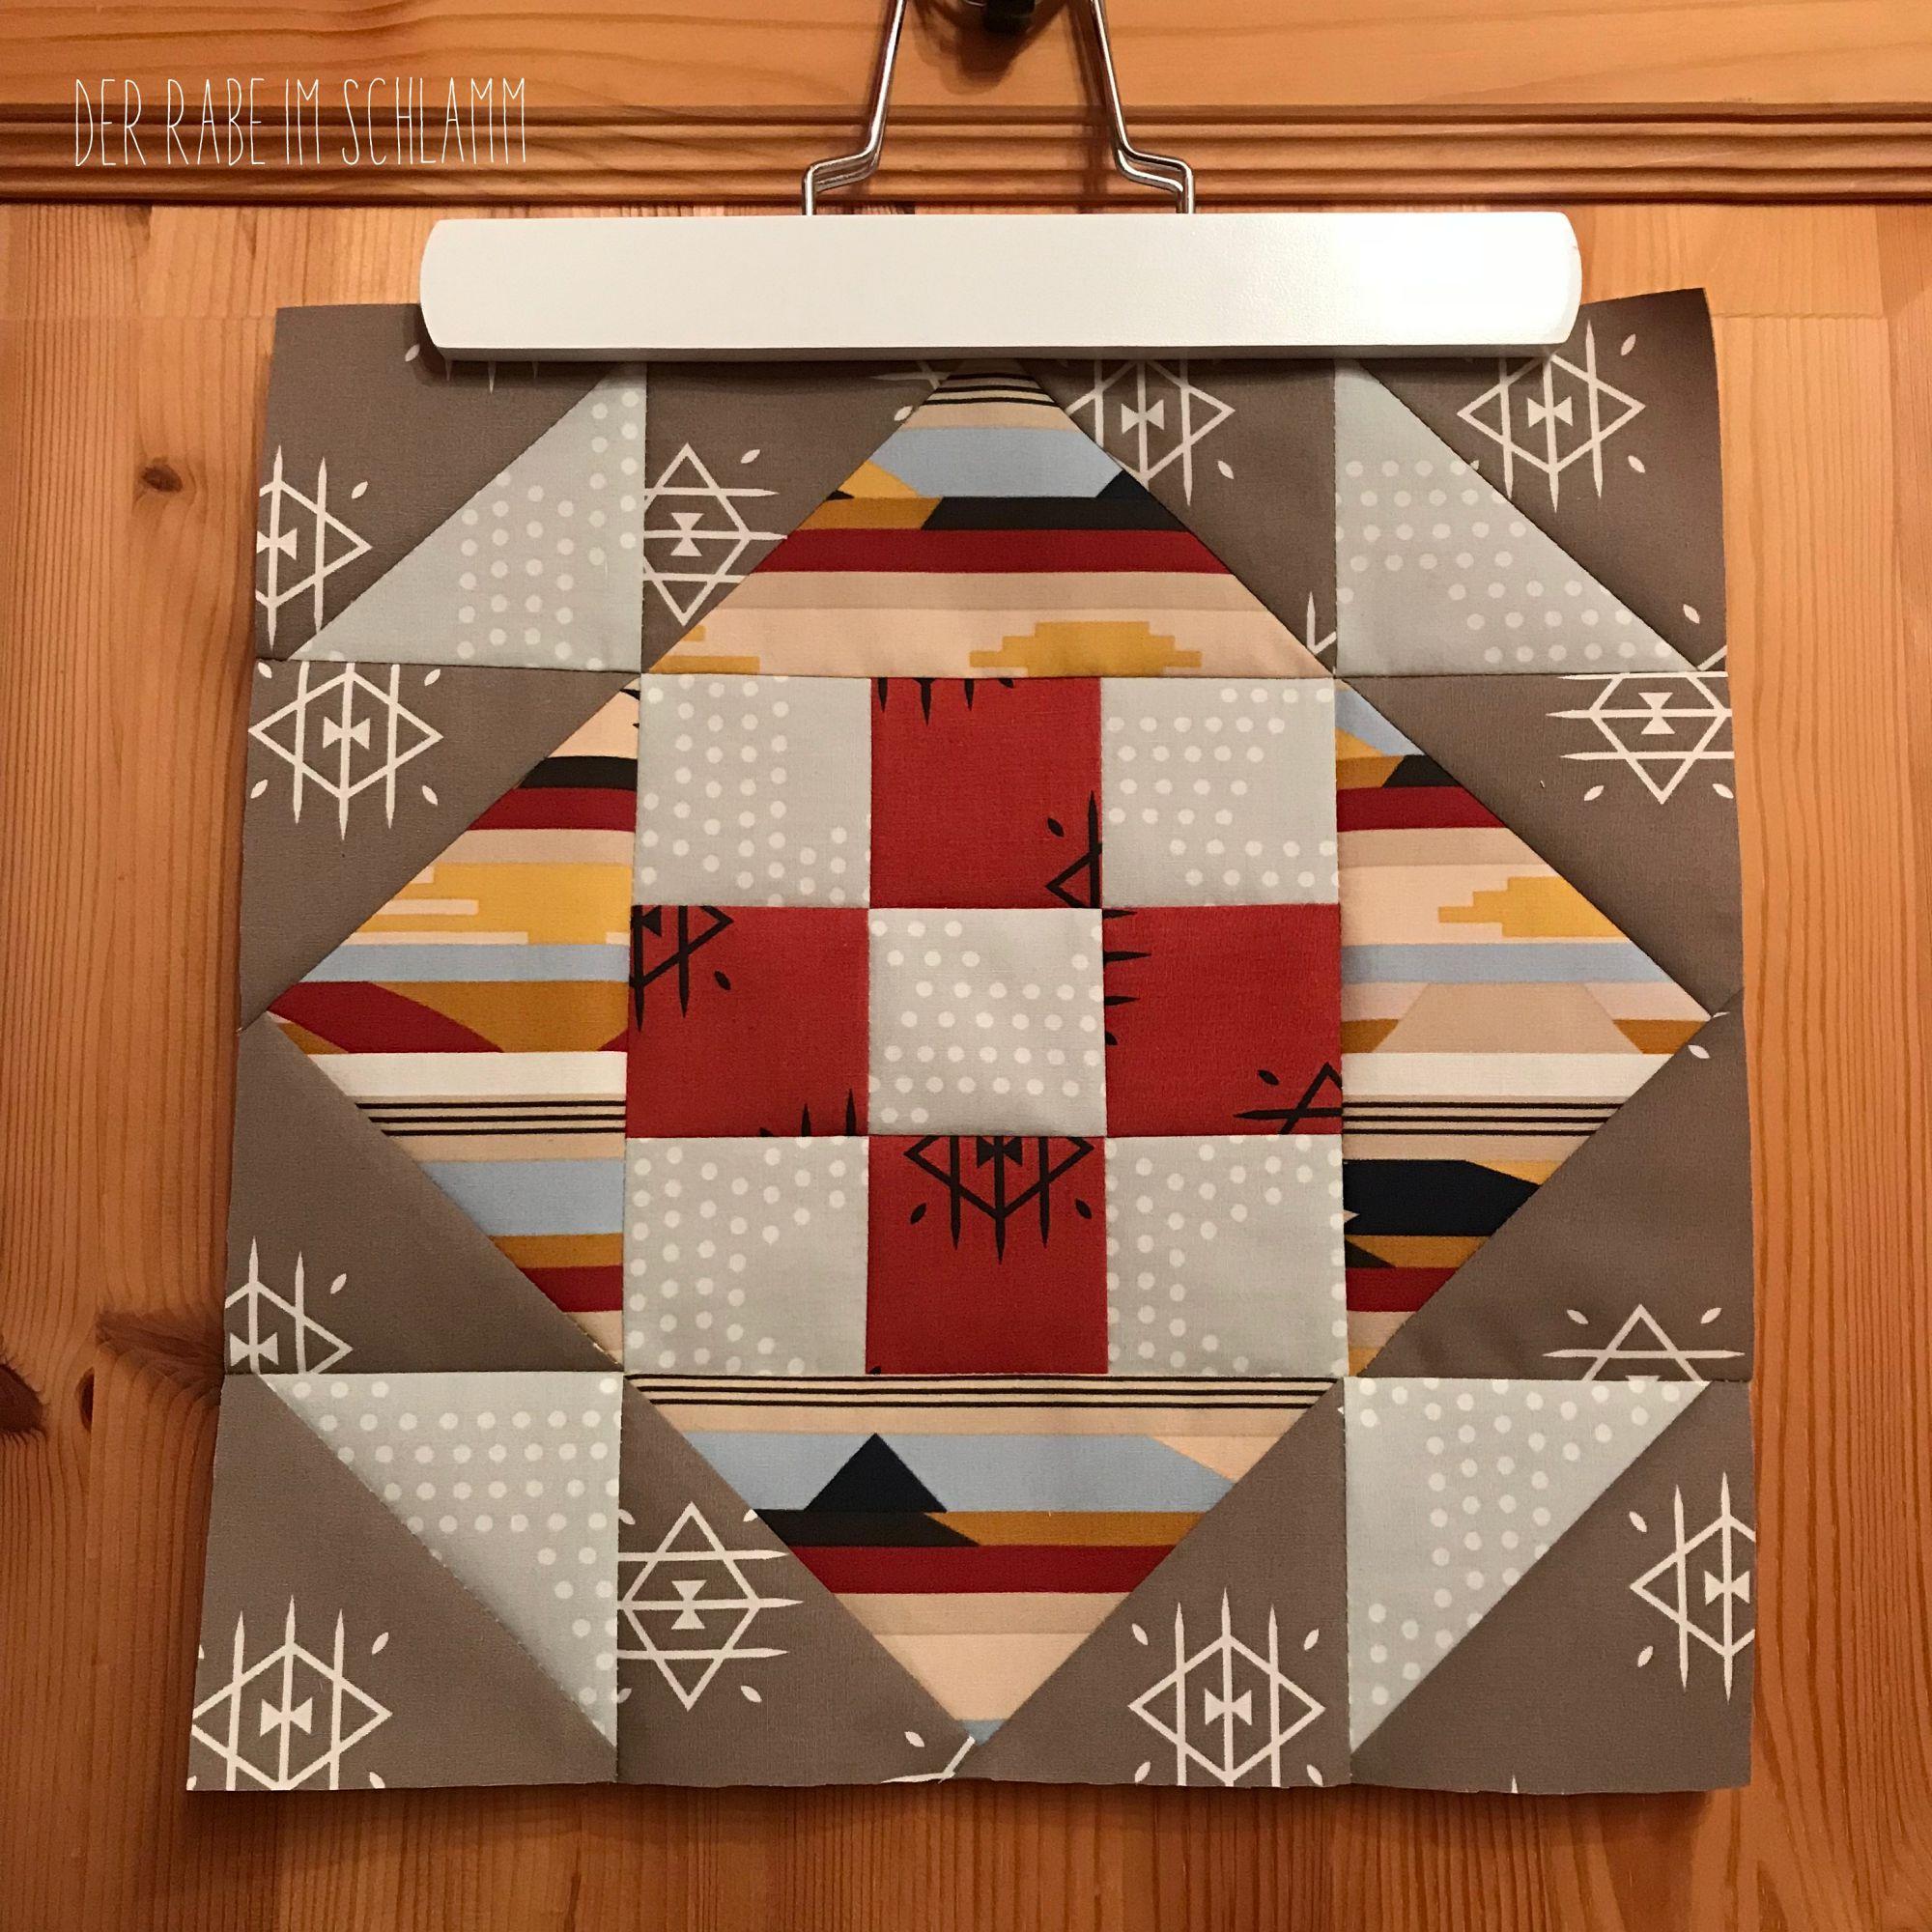 Der Rabe im Schlamm, Quilt, Patchwork, Quiltblock, Community Sampler, Quilt Along, Art Gallery Fabrics, Arizona After, April Rhodes